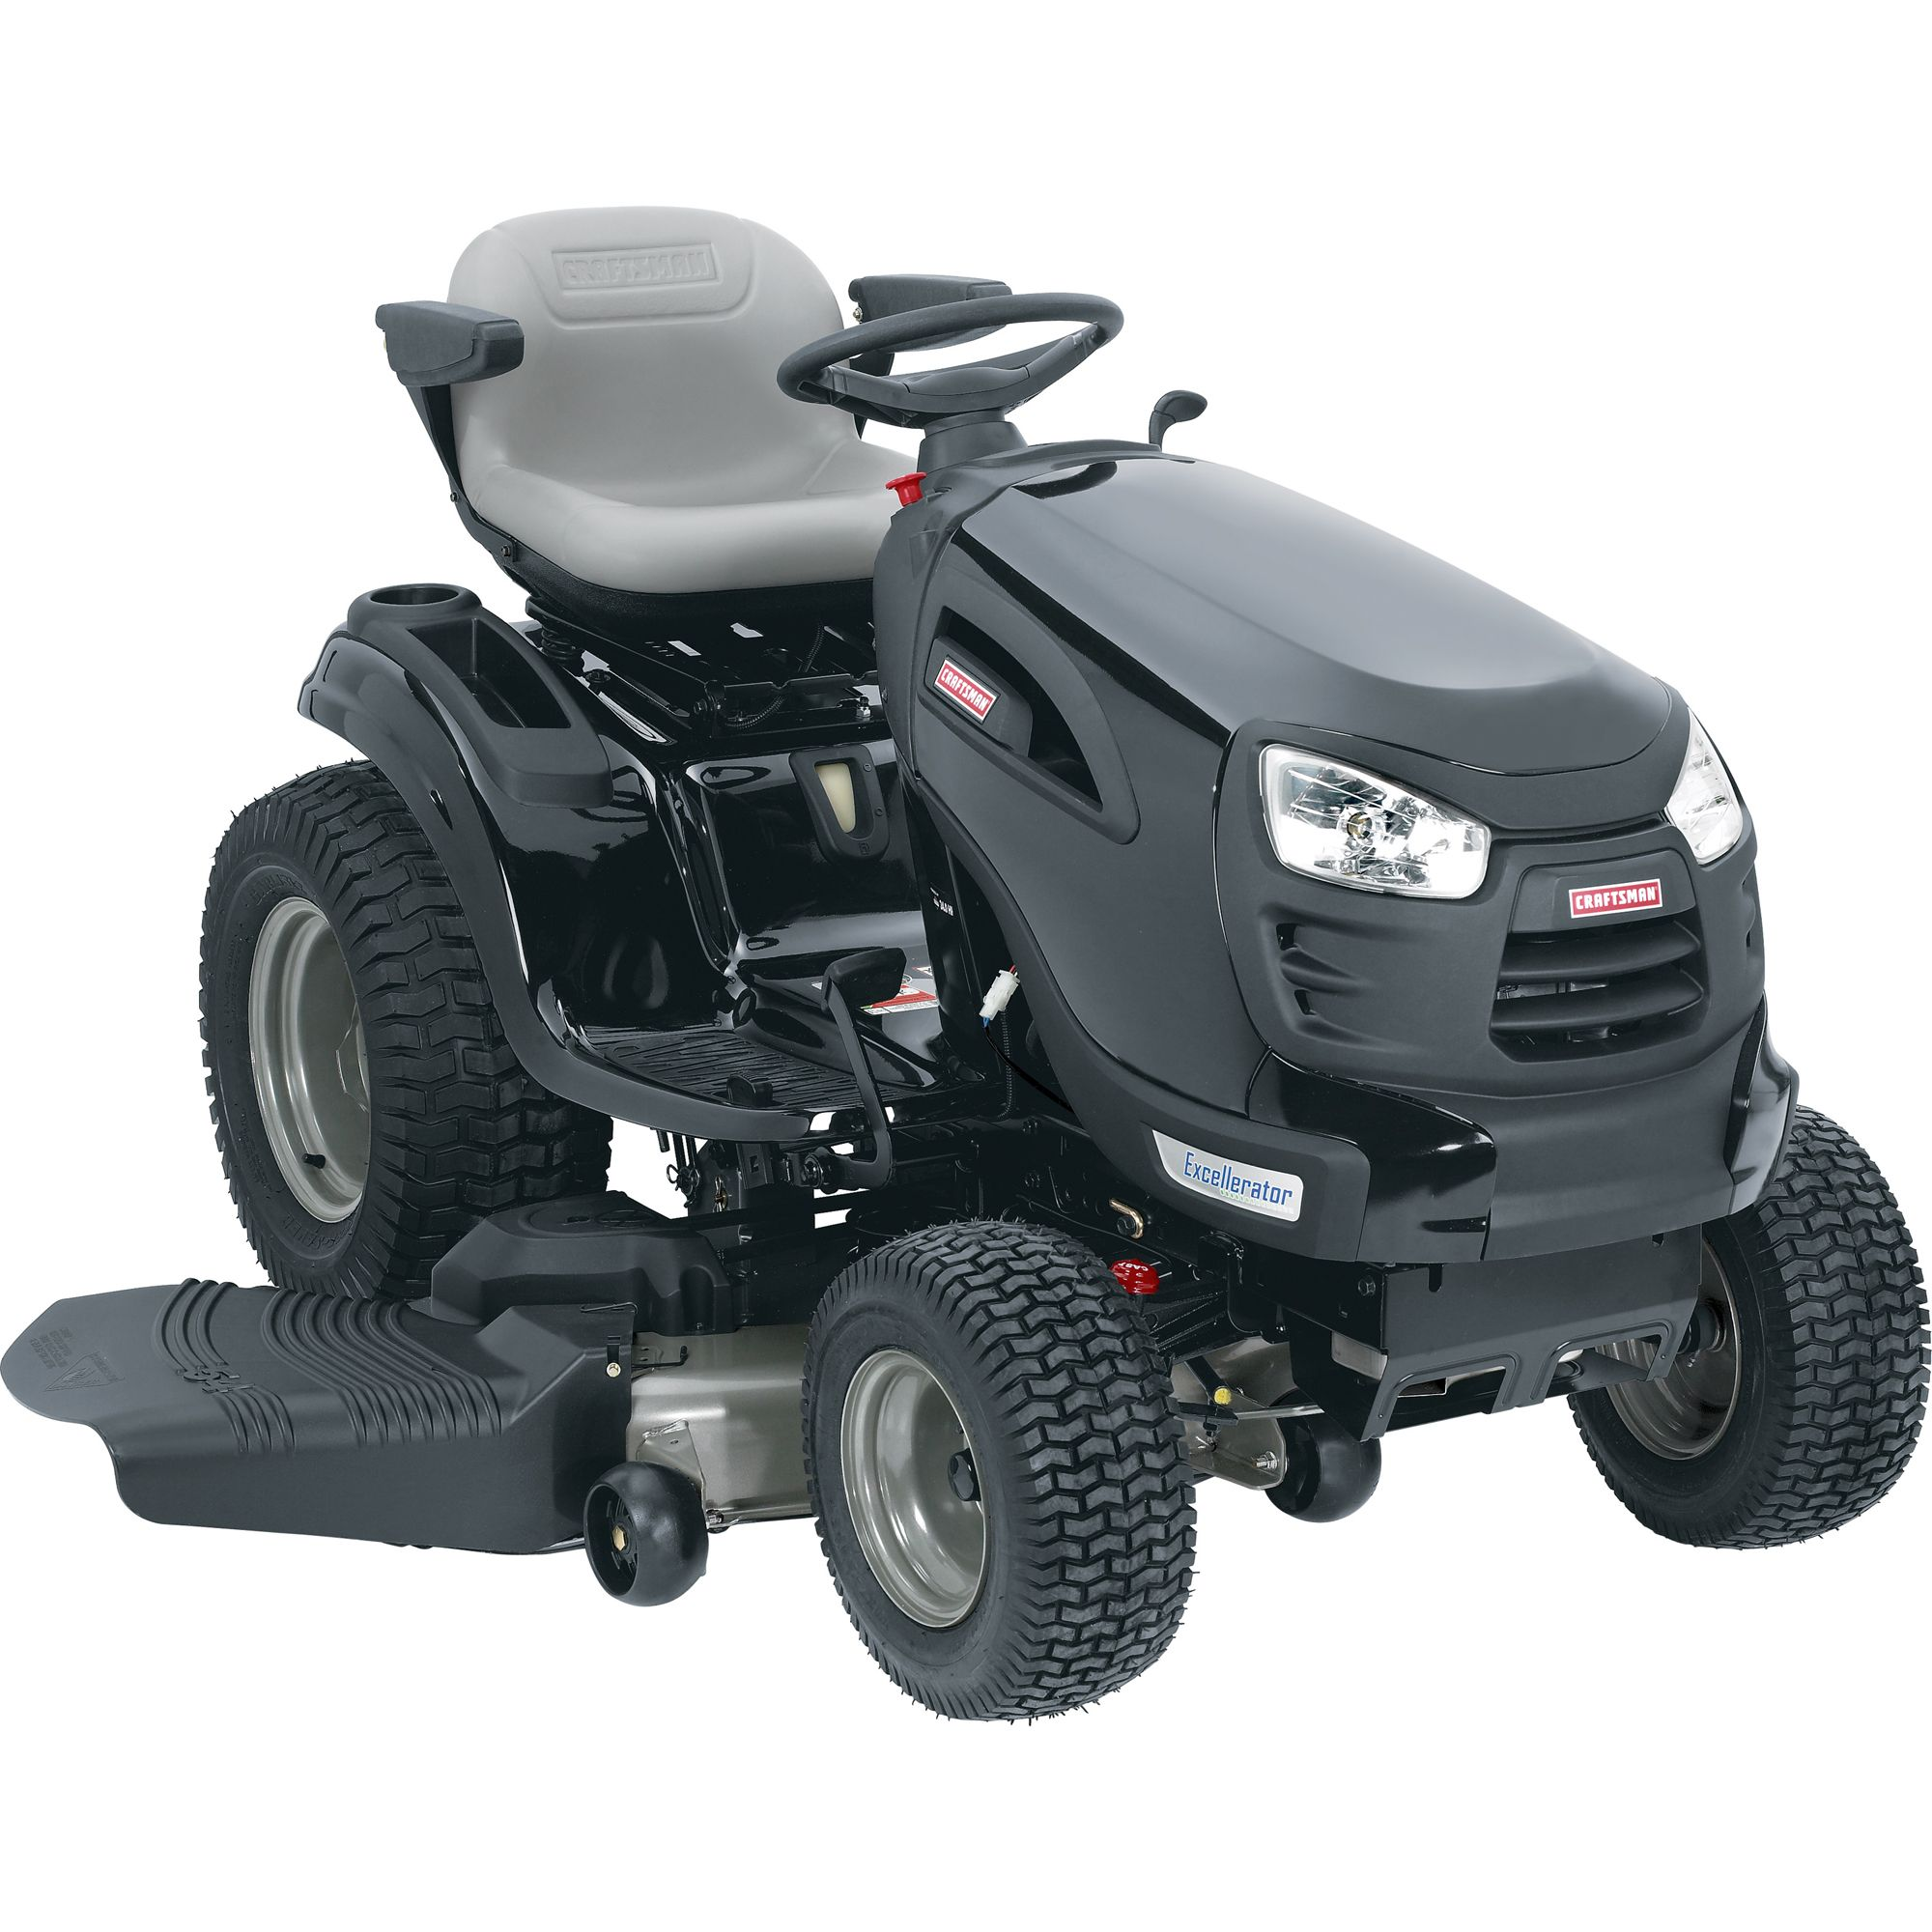 craftsman 28947 gt 5000 54 kohler 26 hp gas powered riding garden craftsman gt5000 wiring harness [ 2000 x 2000 Pixel ]